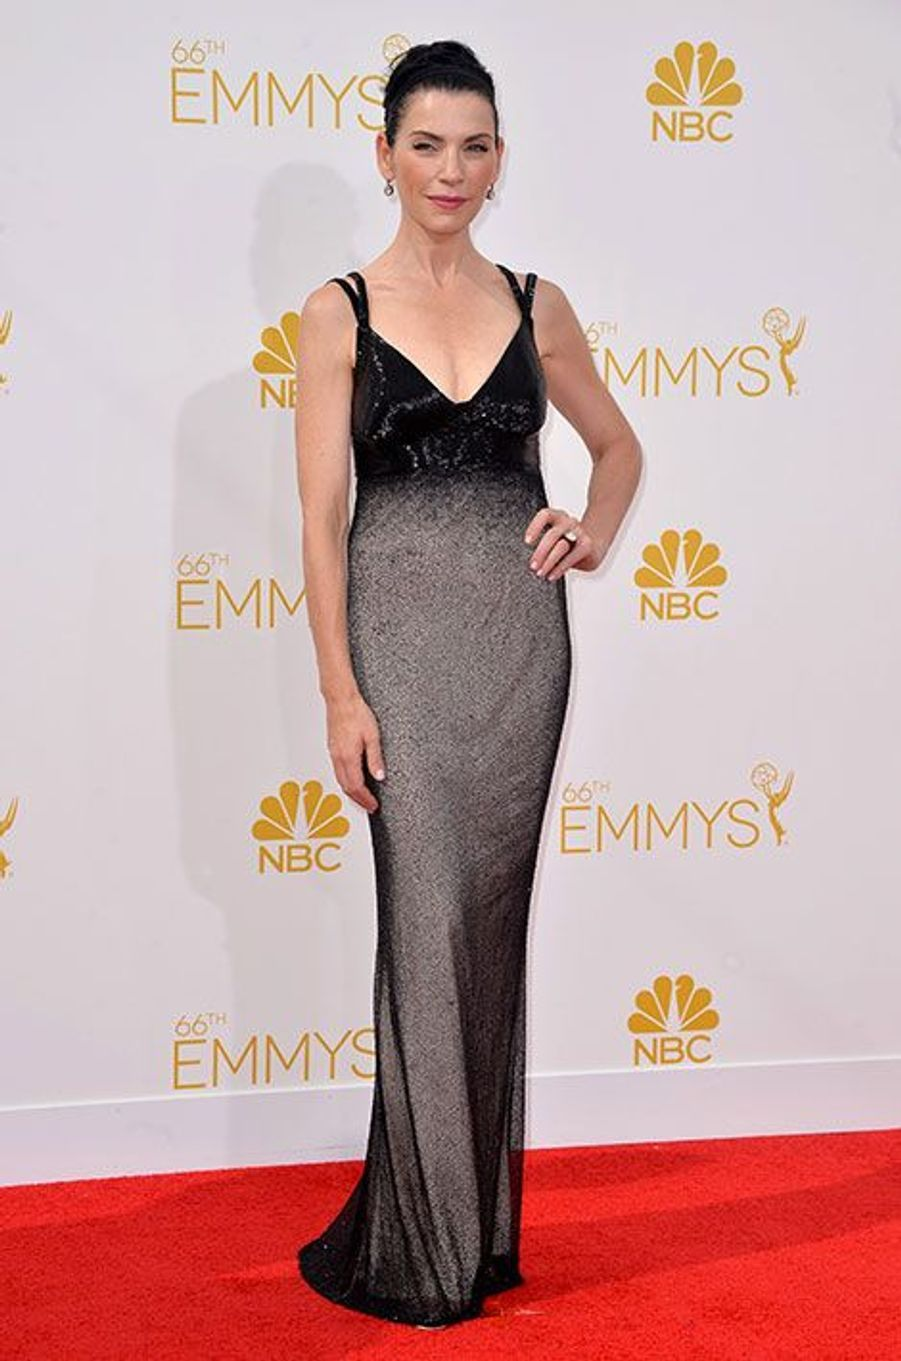 Julianna Margulies aux Emmy Awards 2014